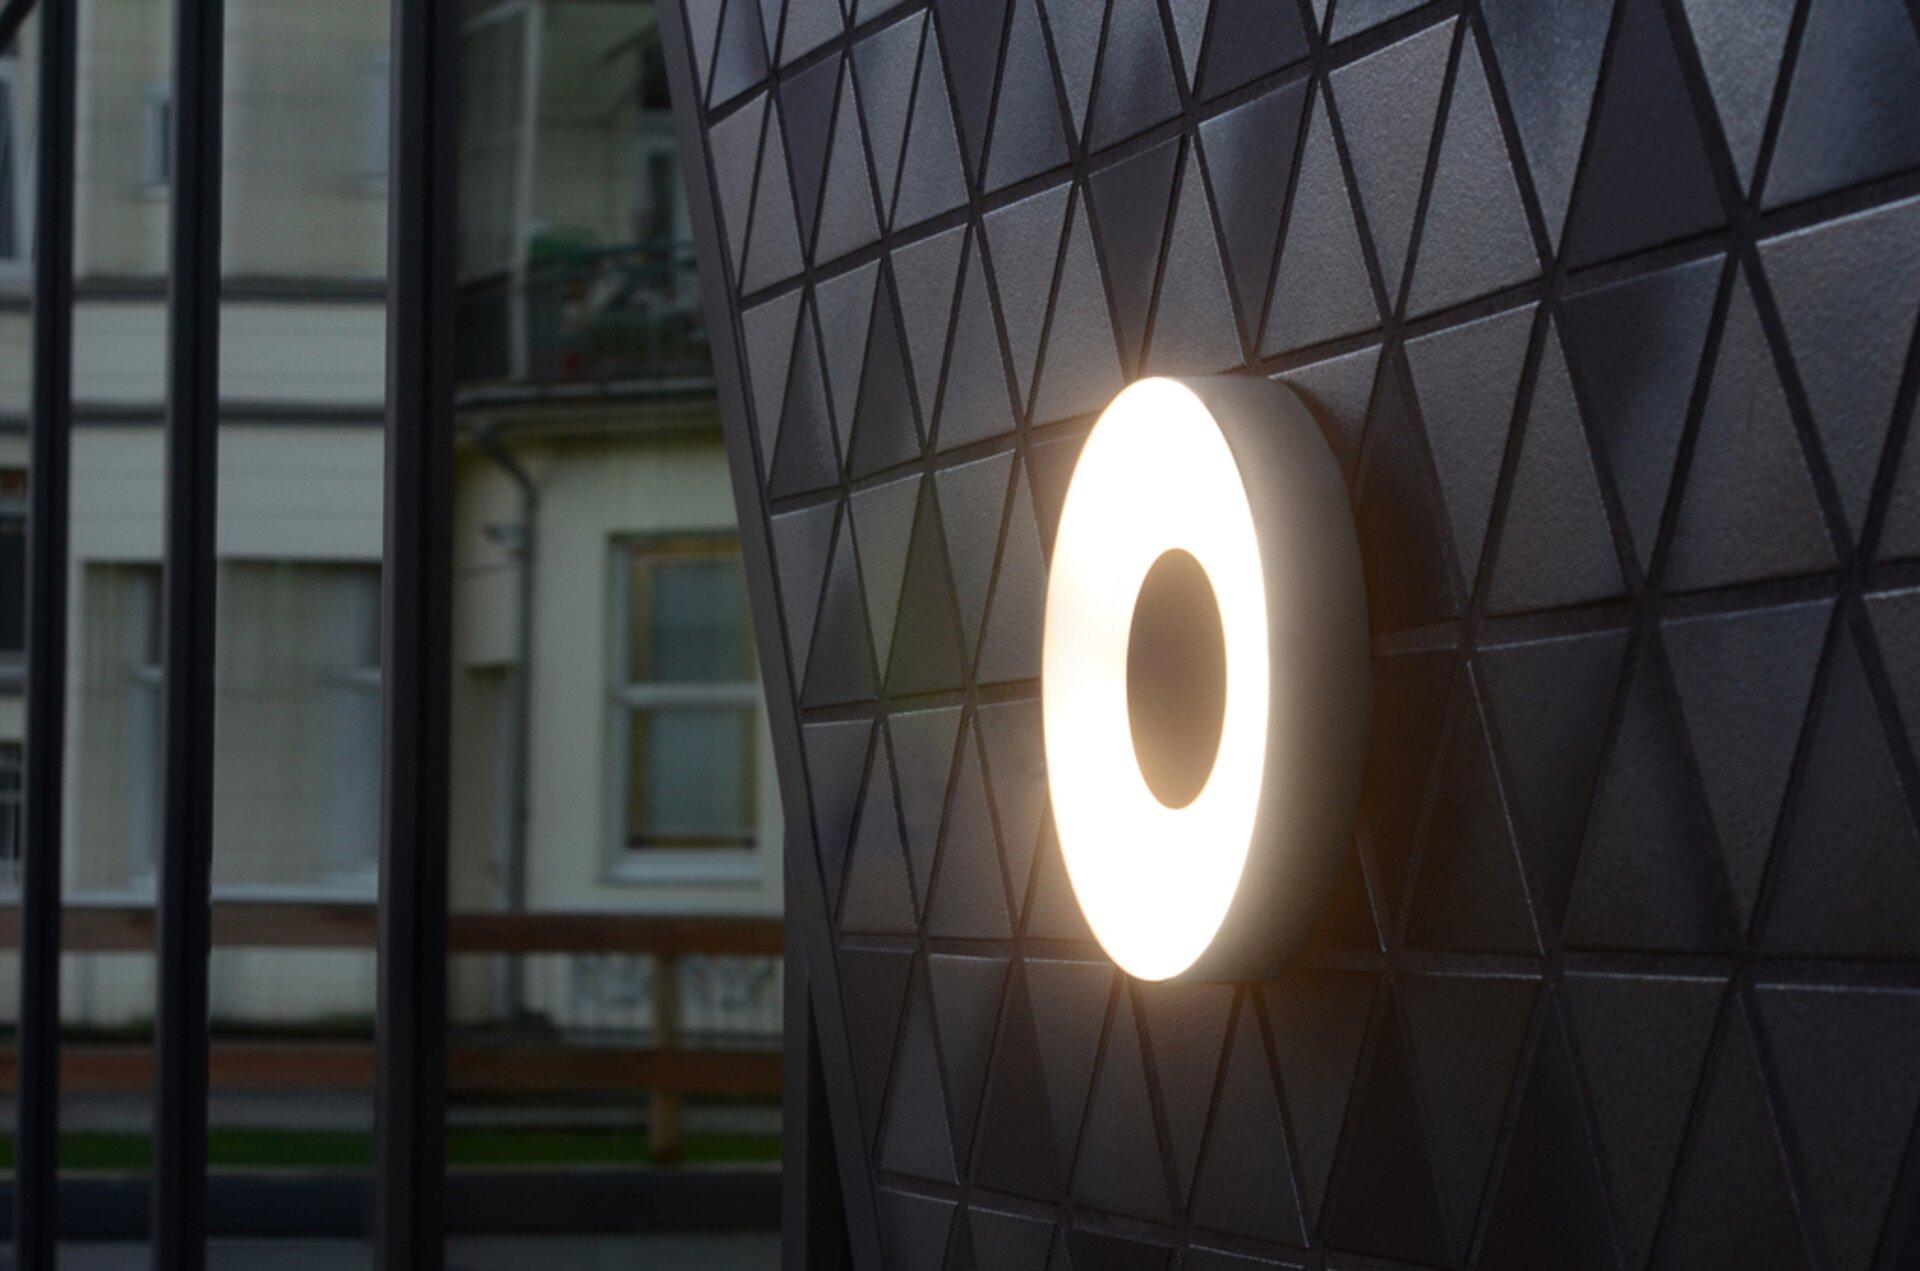 Wand-Aussenleuchte Ublo Eco-Light Metall 19 x 5 x 19 cm